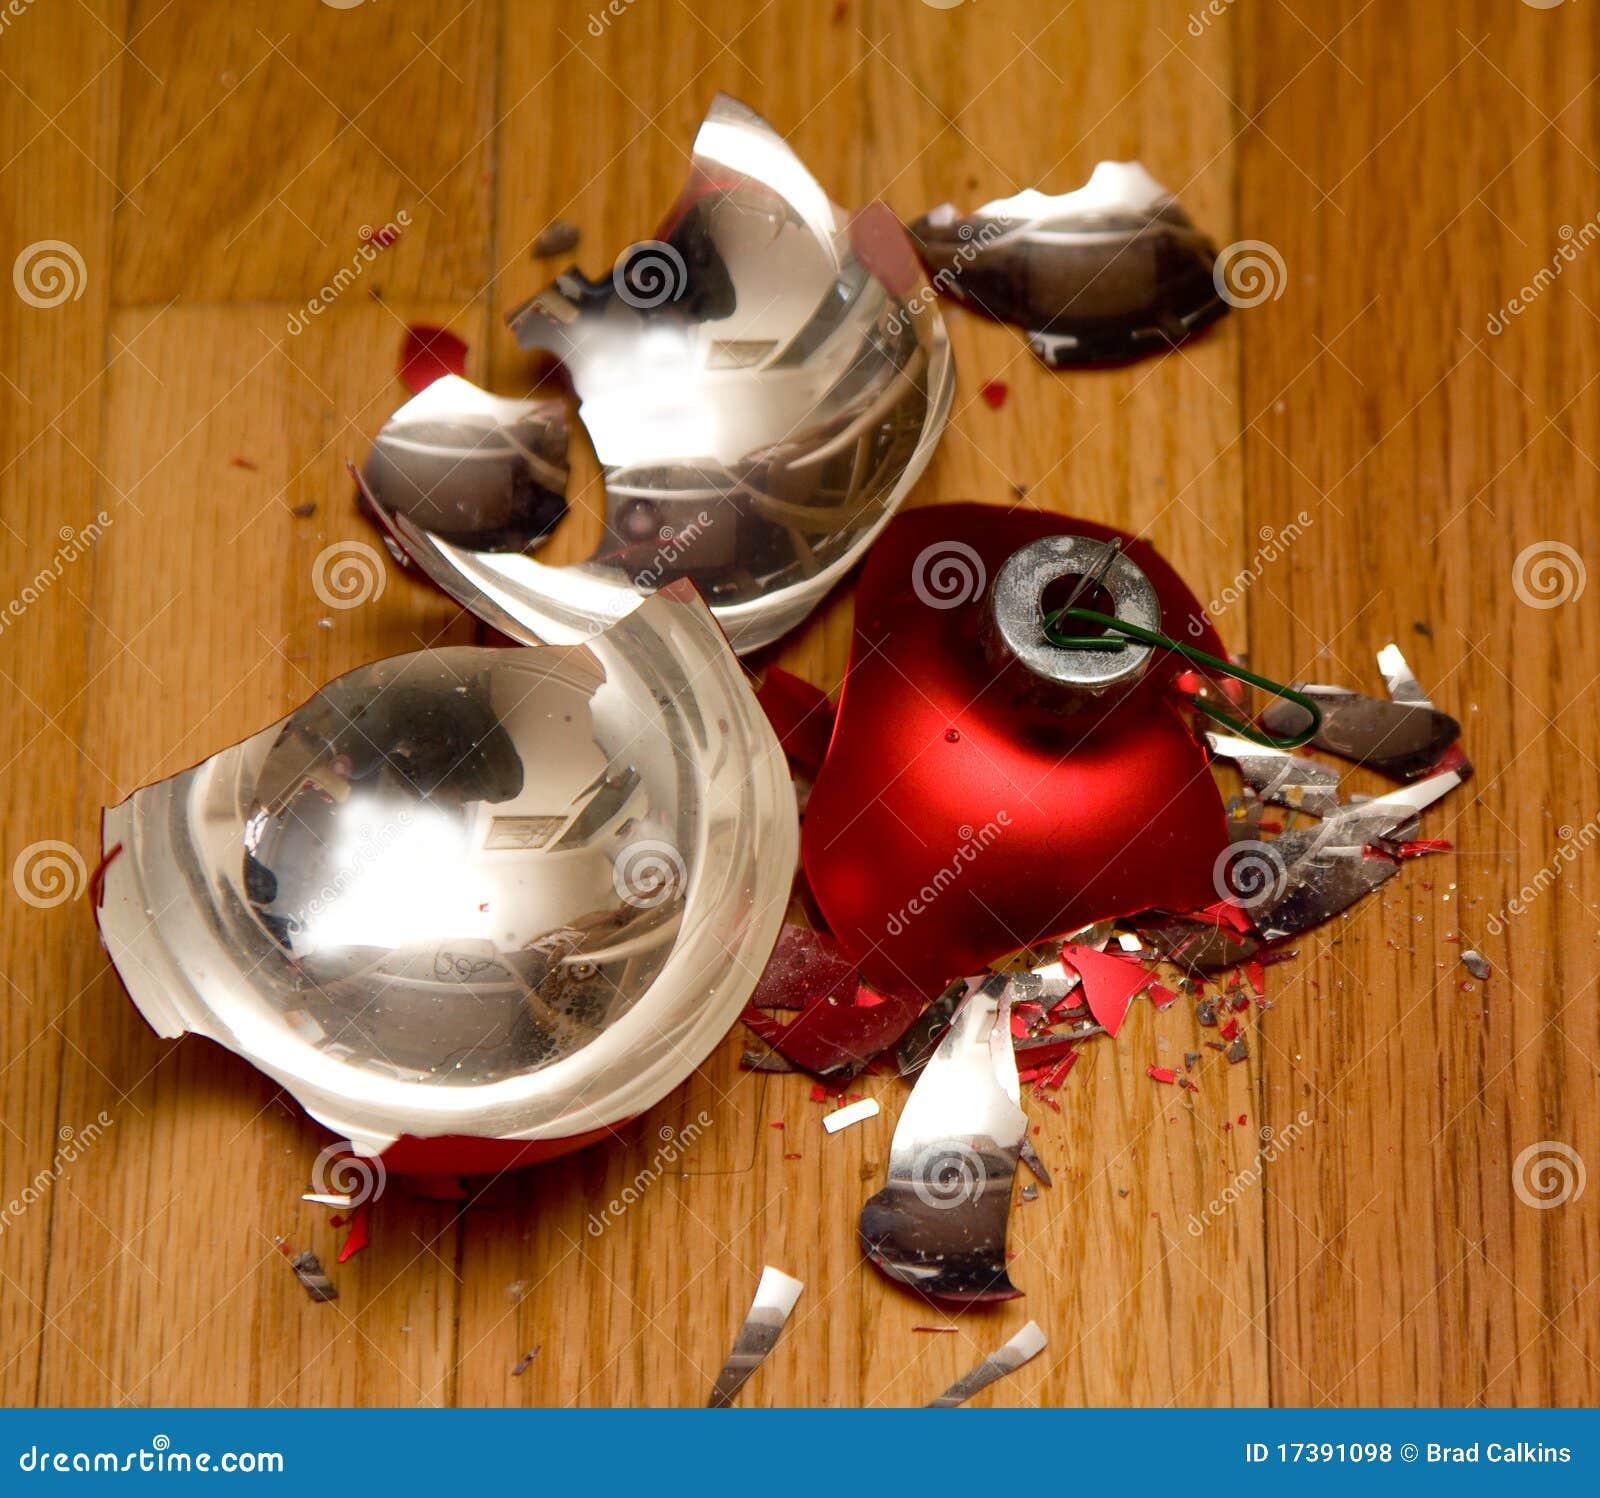 Broken Ornament Royalty Free Stock Photos - Image: 17391098